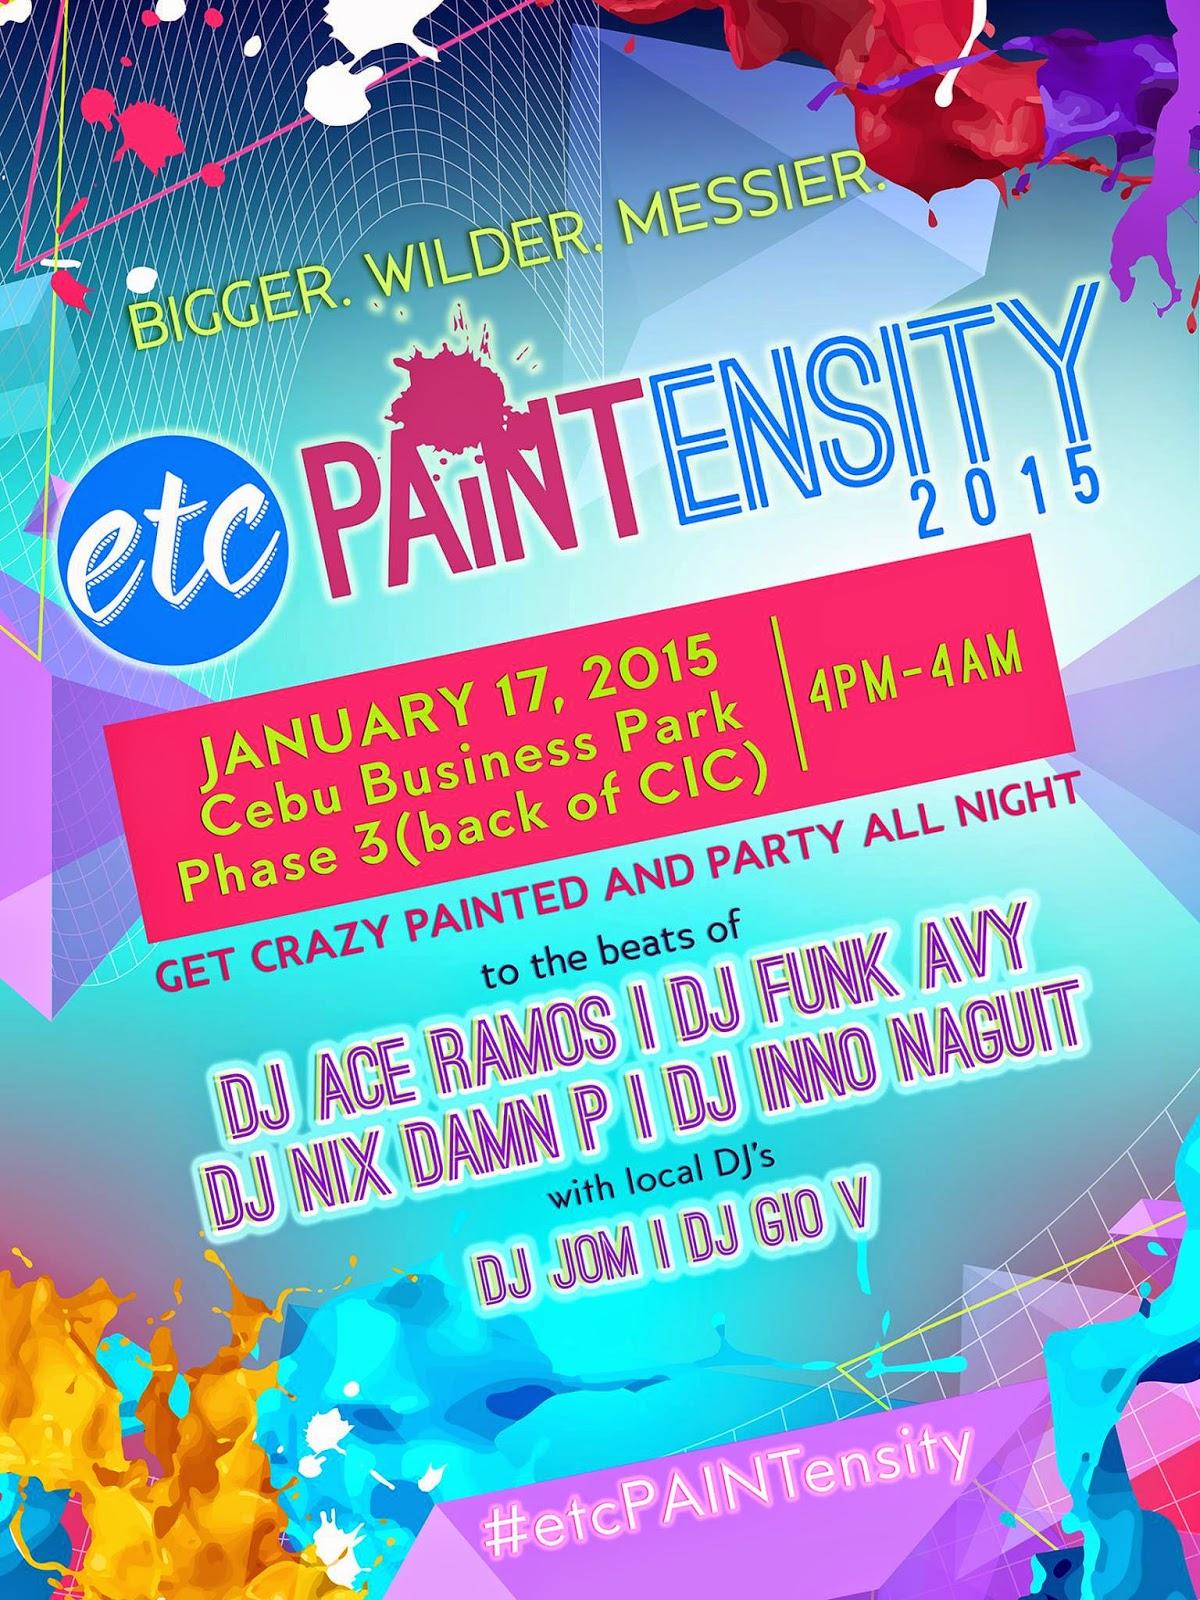 Sinulog-2015-Paintensity-Cebu-Business-Park-Ayala